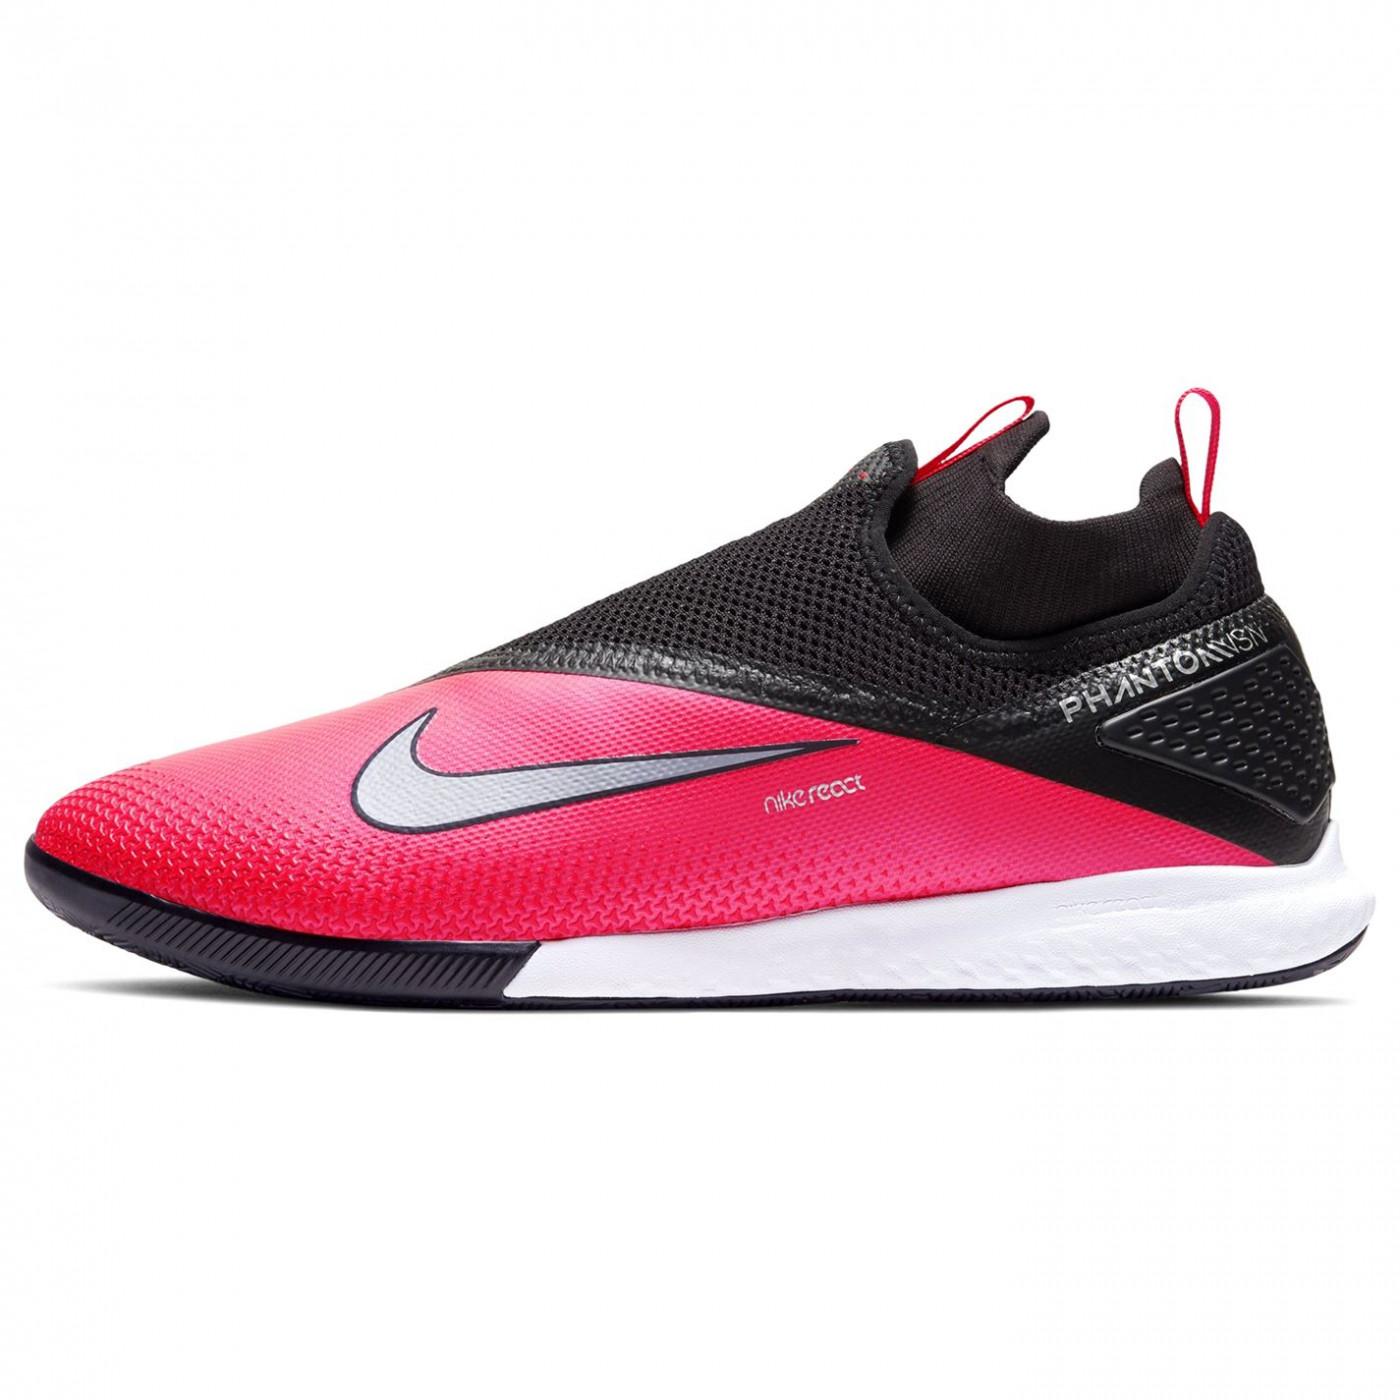 Nike Phantom Vision Pro DF Men's Indoor Football Trainers